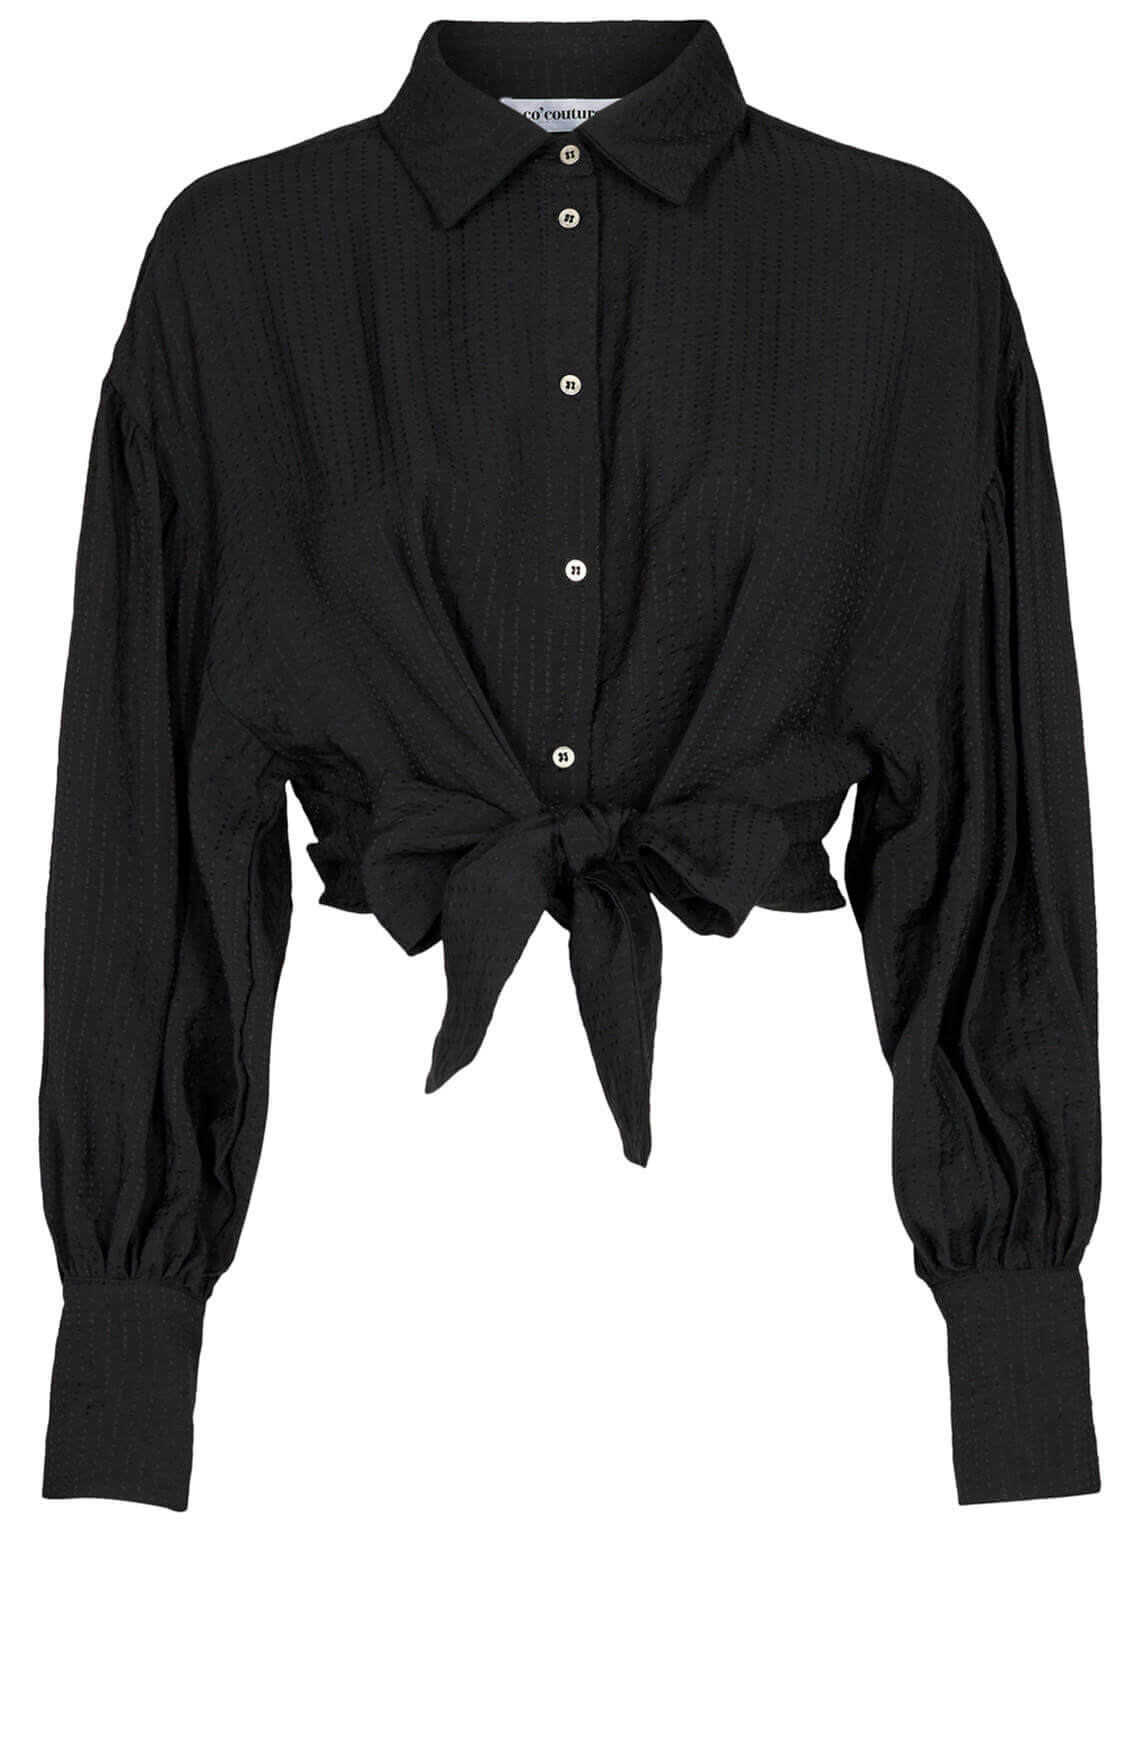 Co Couture Dames Remi blouse zwart